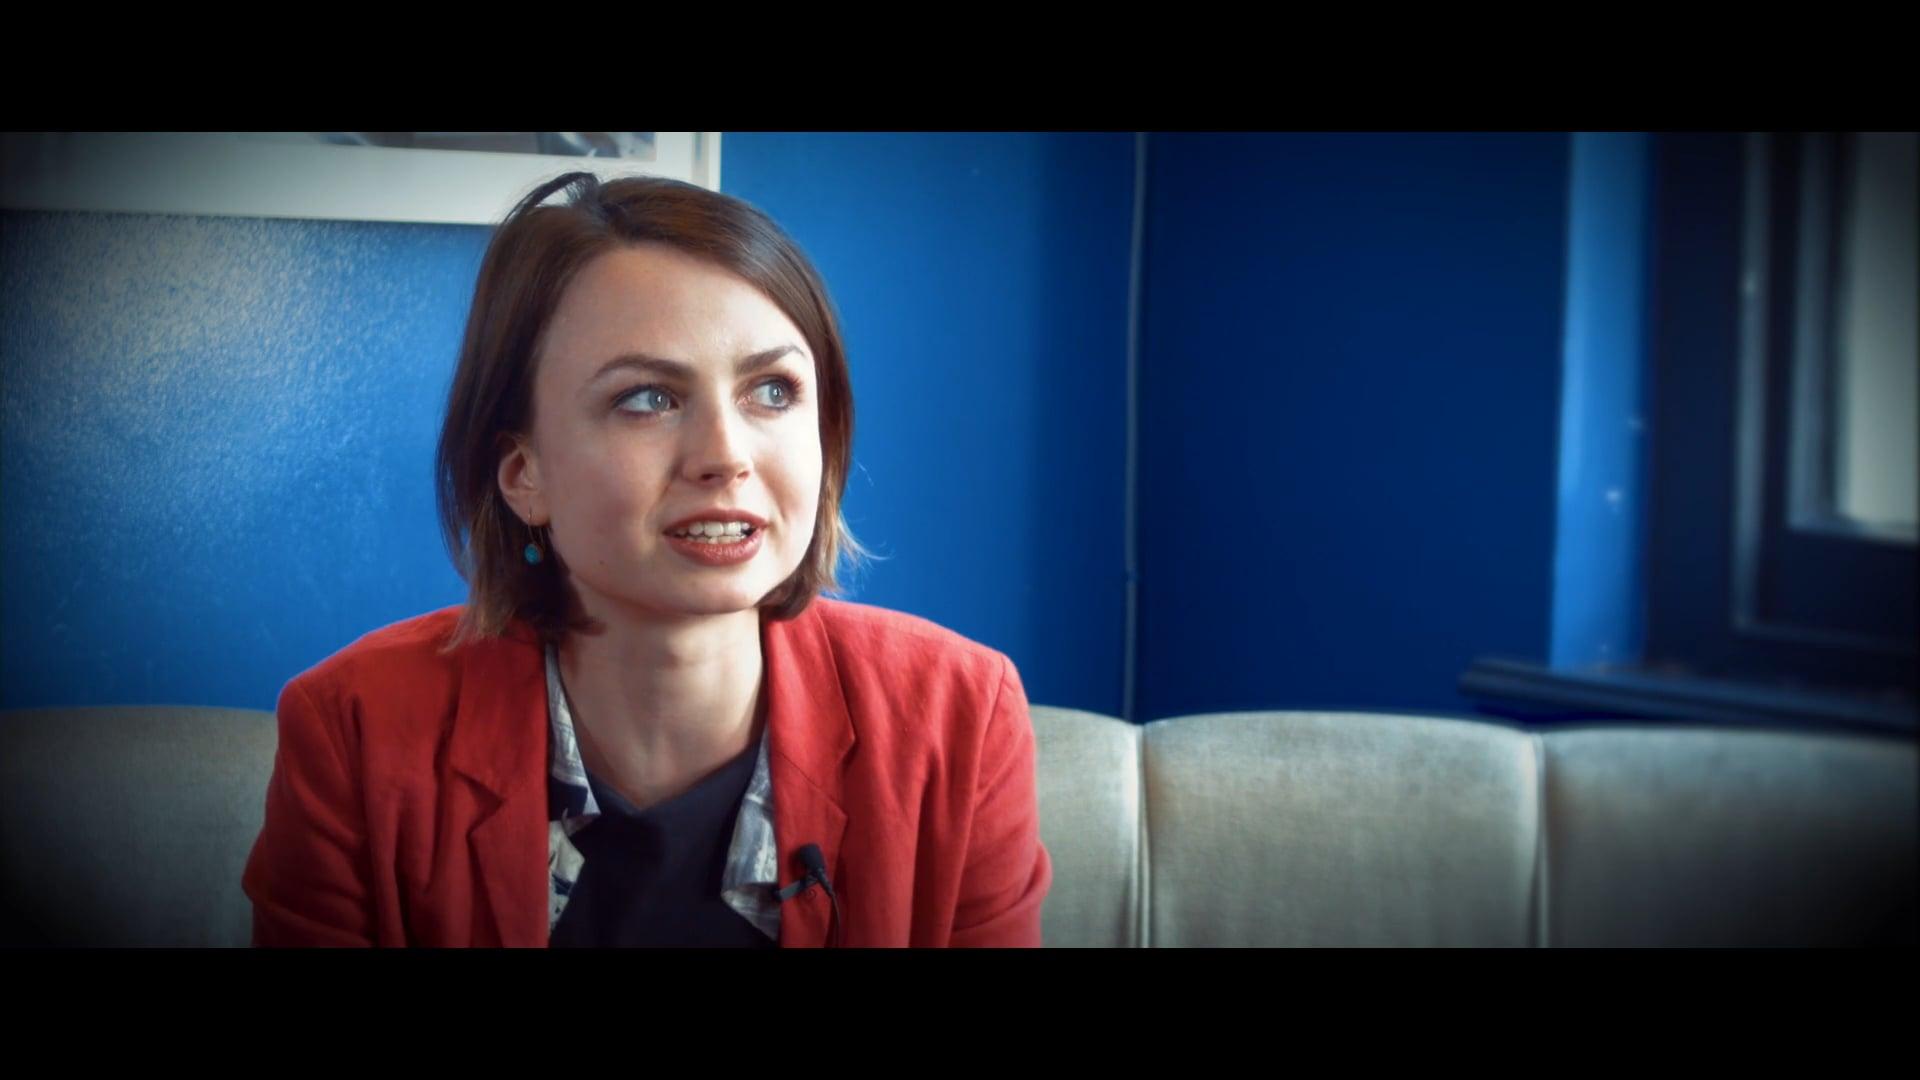 Olivia Pinkney - Actor